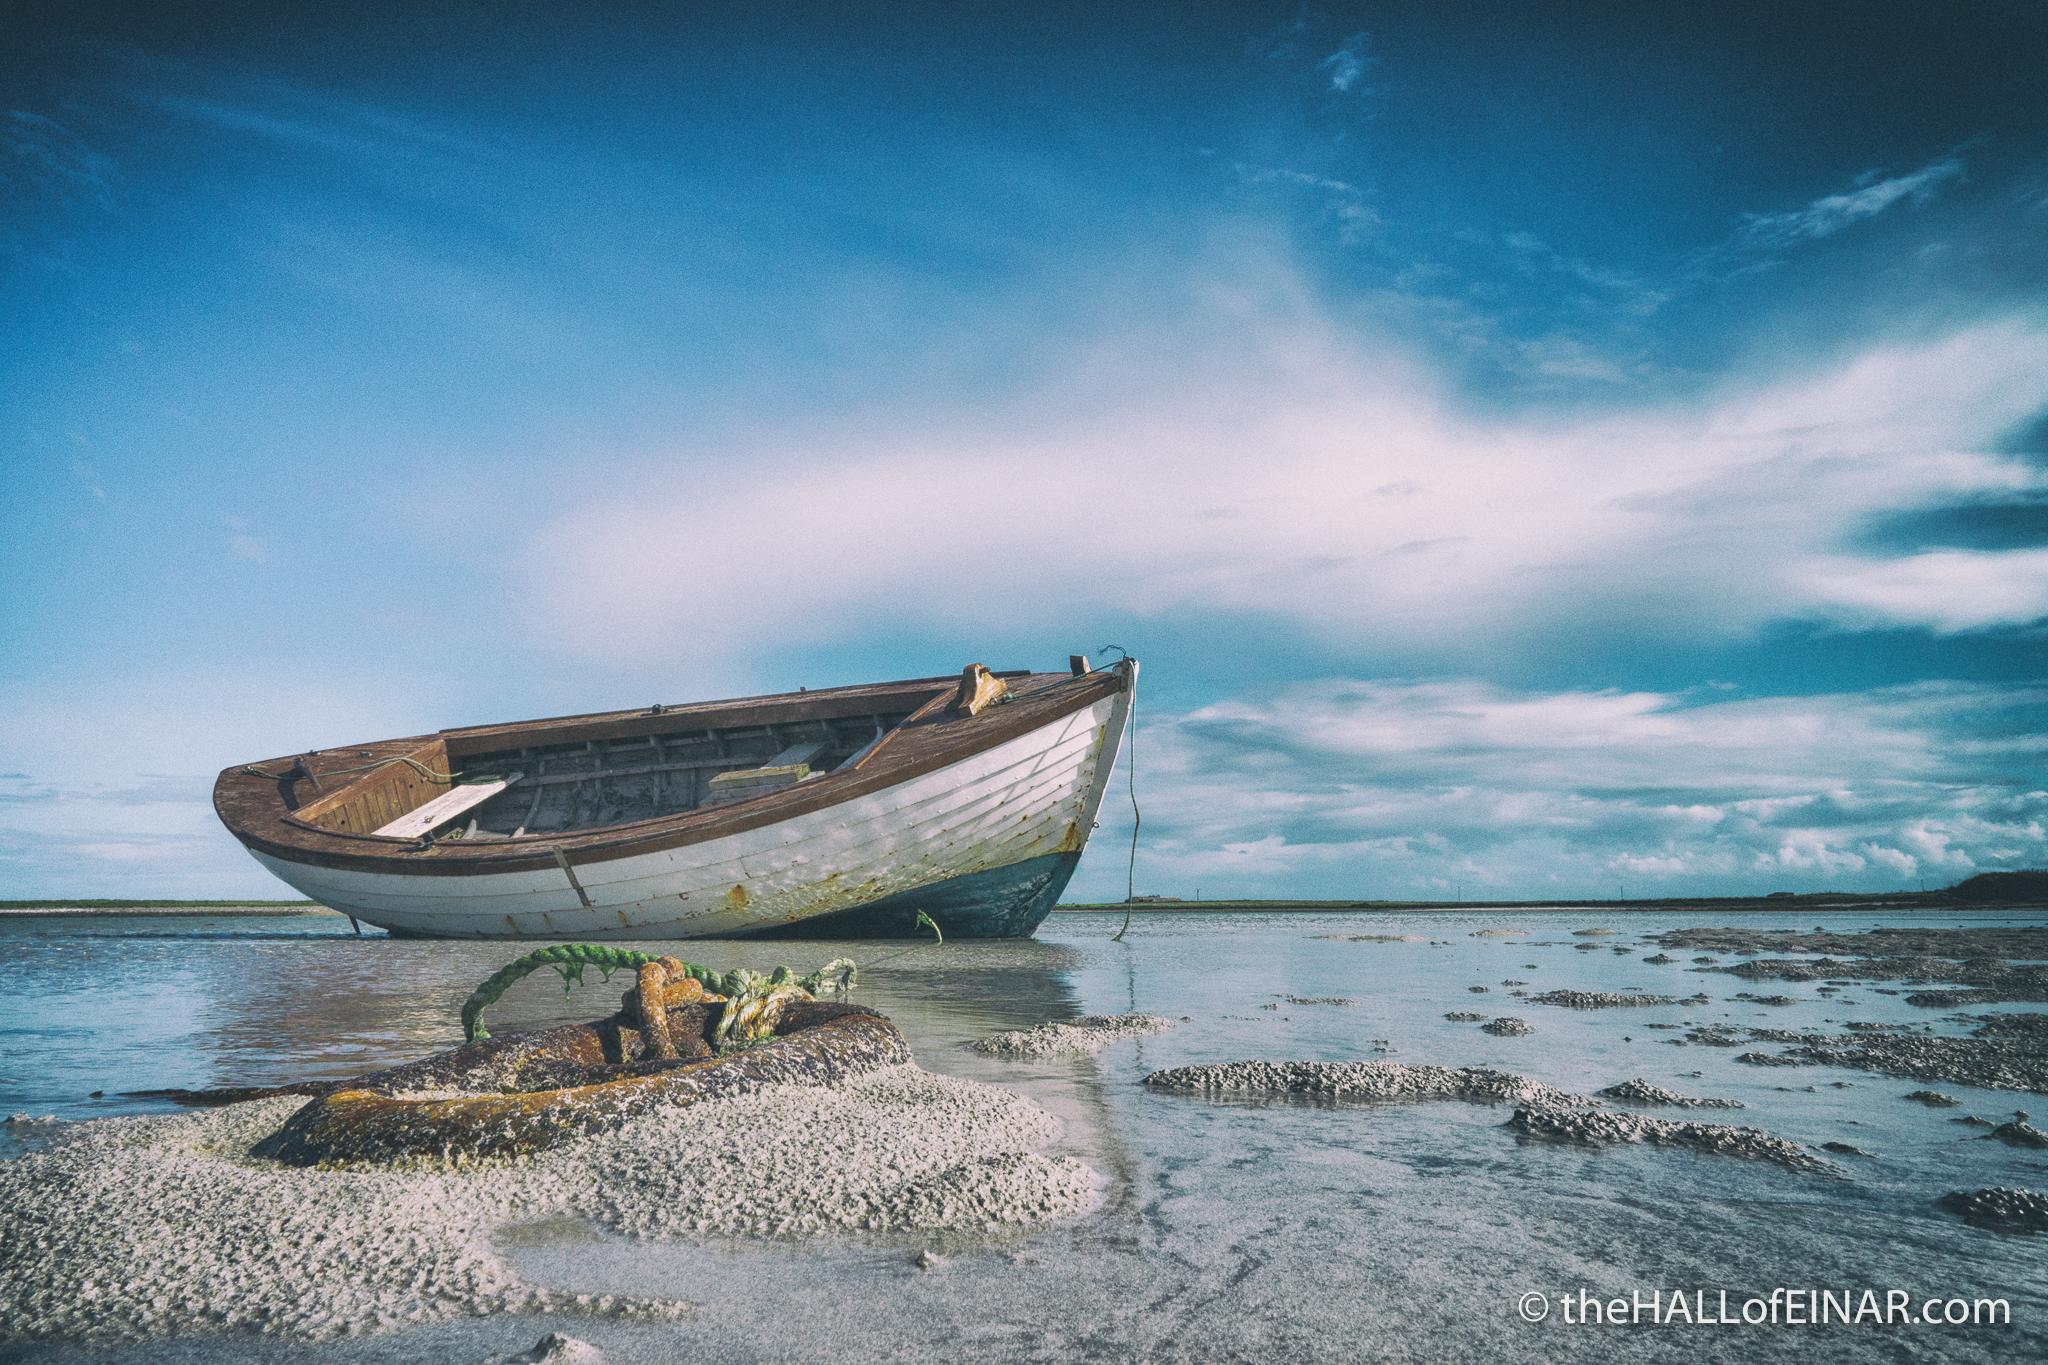 Westray - The Bay of Skaill - photograph (c) David Bailey (not the)